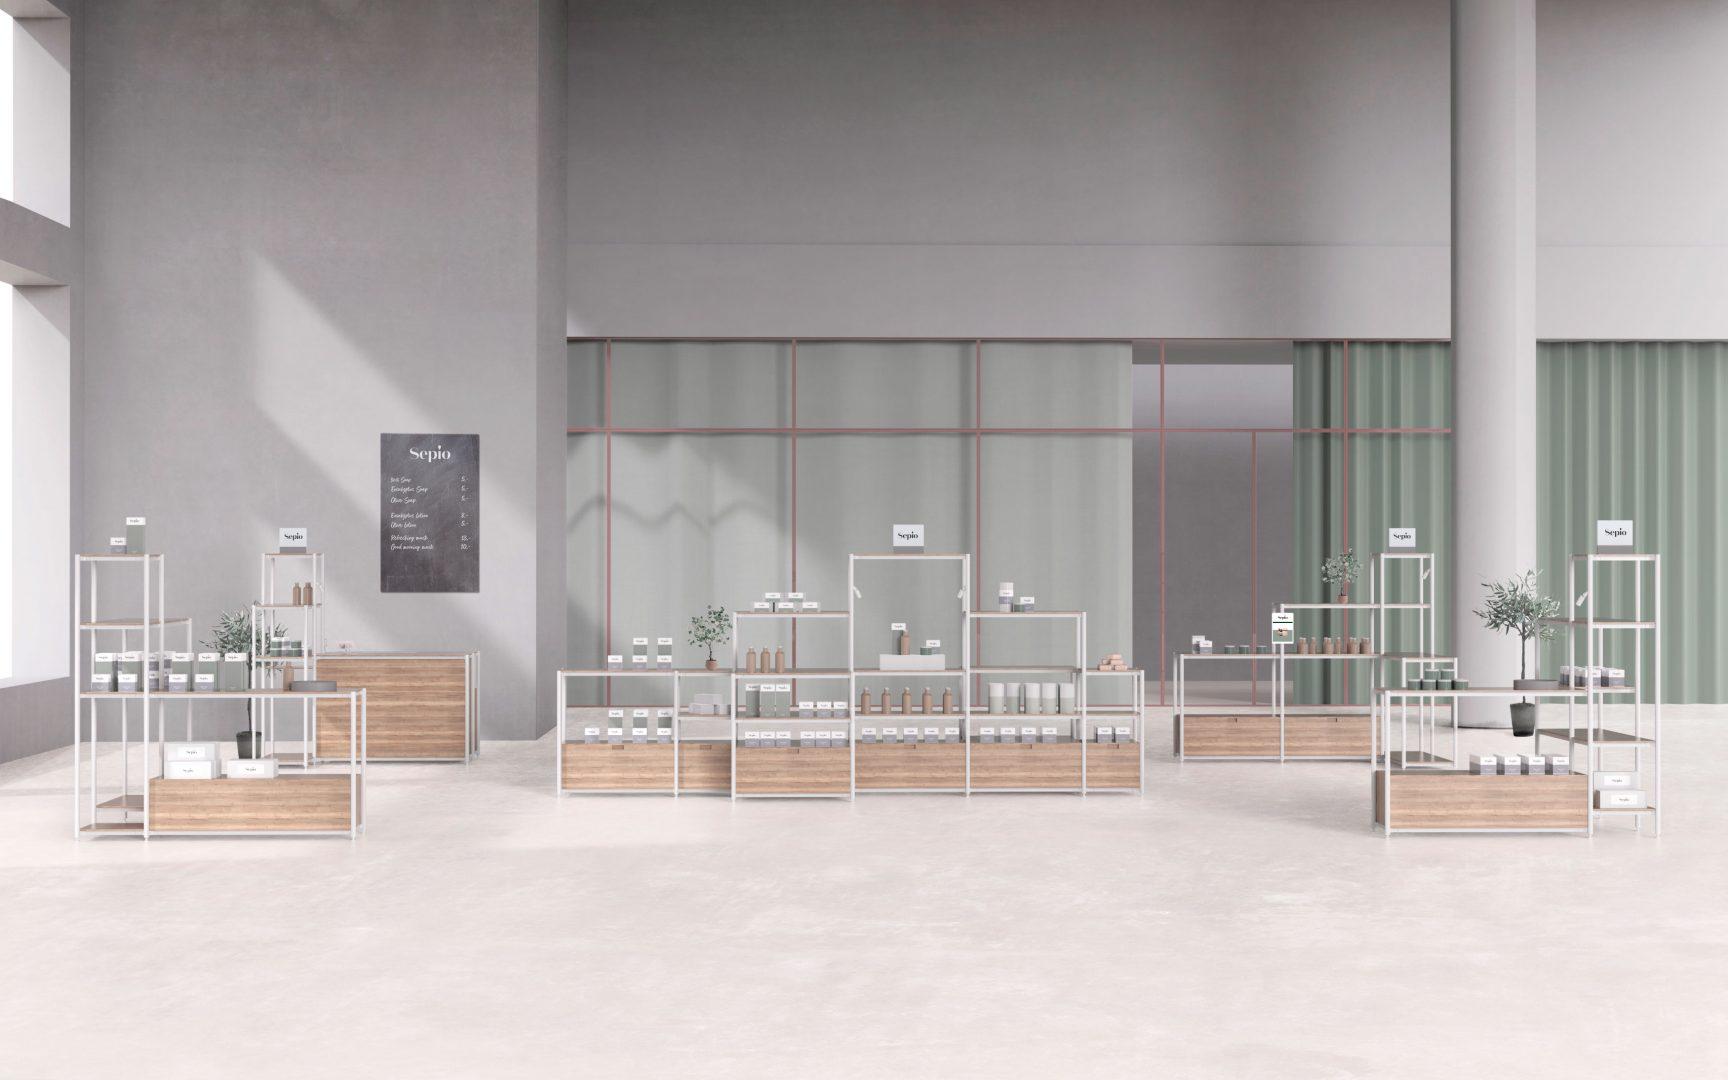 atelier-522-omnio-boutique-pop-up